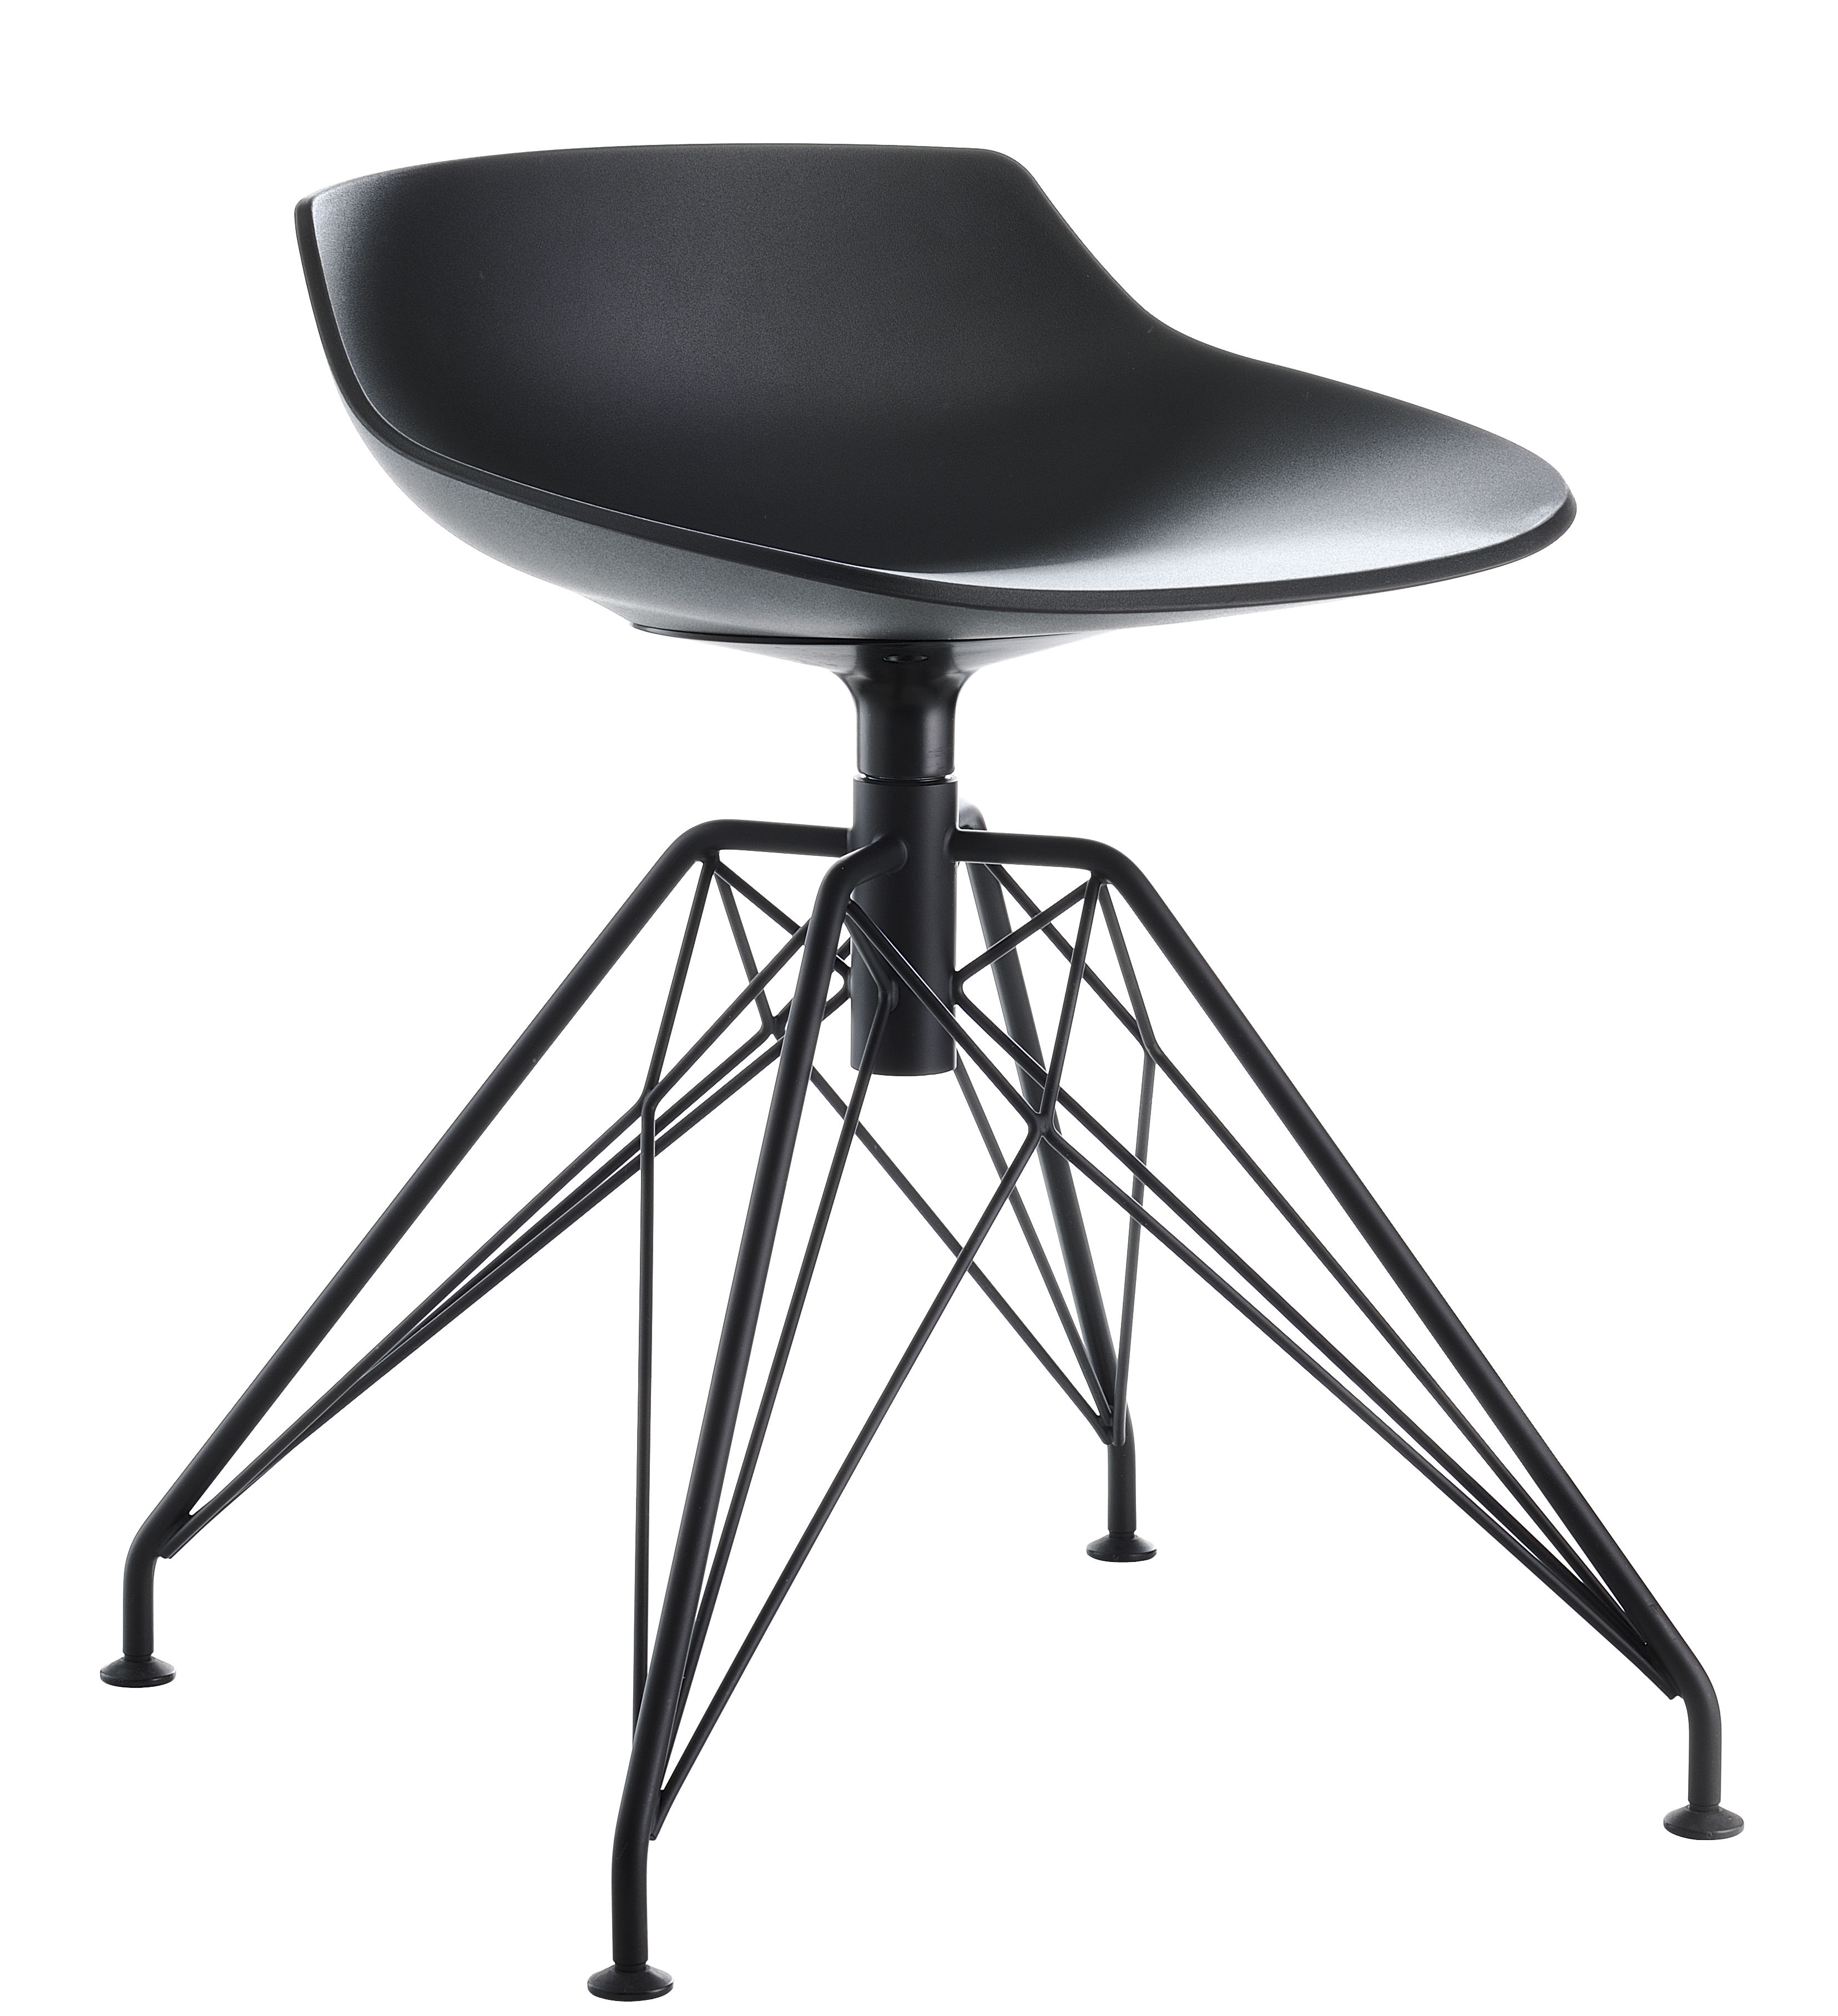 tabouret flow h 44 cm 4 pieds lem noir pied graphite mdf italia. Black Bedroom Furniture Sets. Home Design Ideas